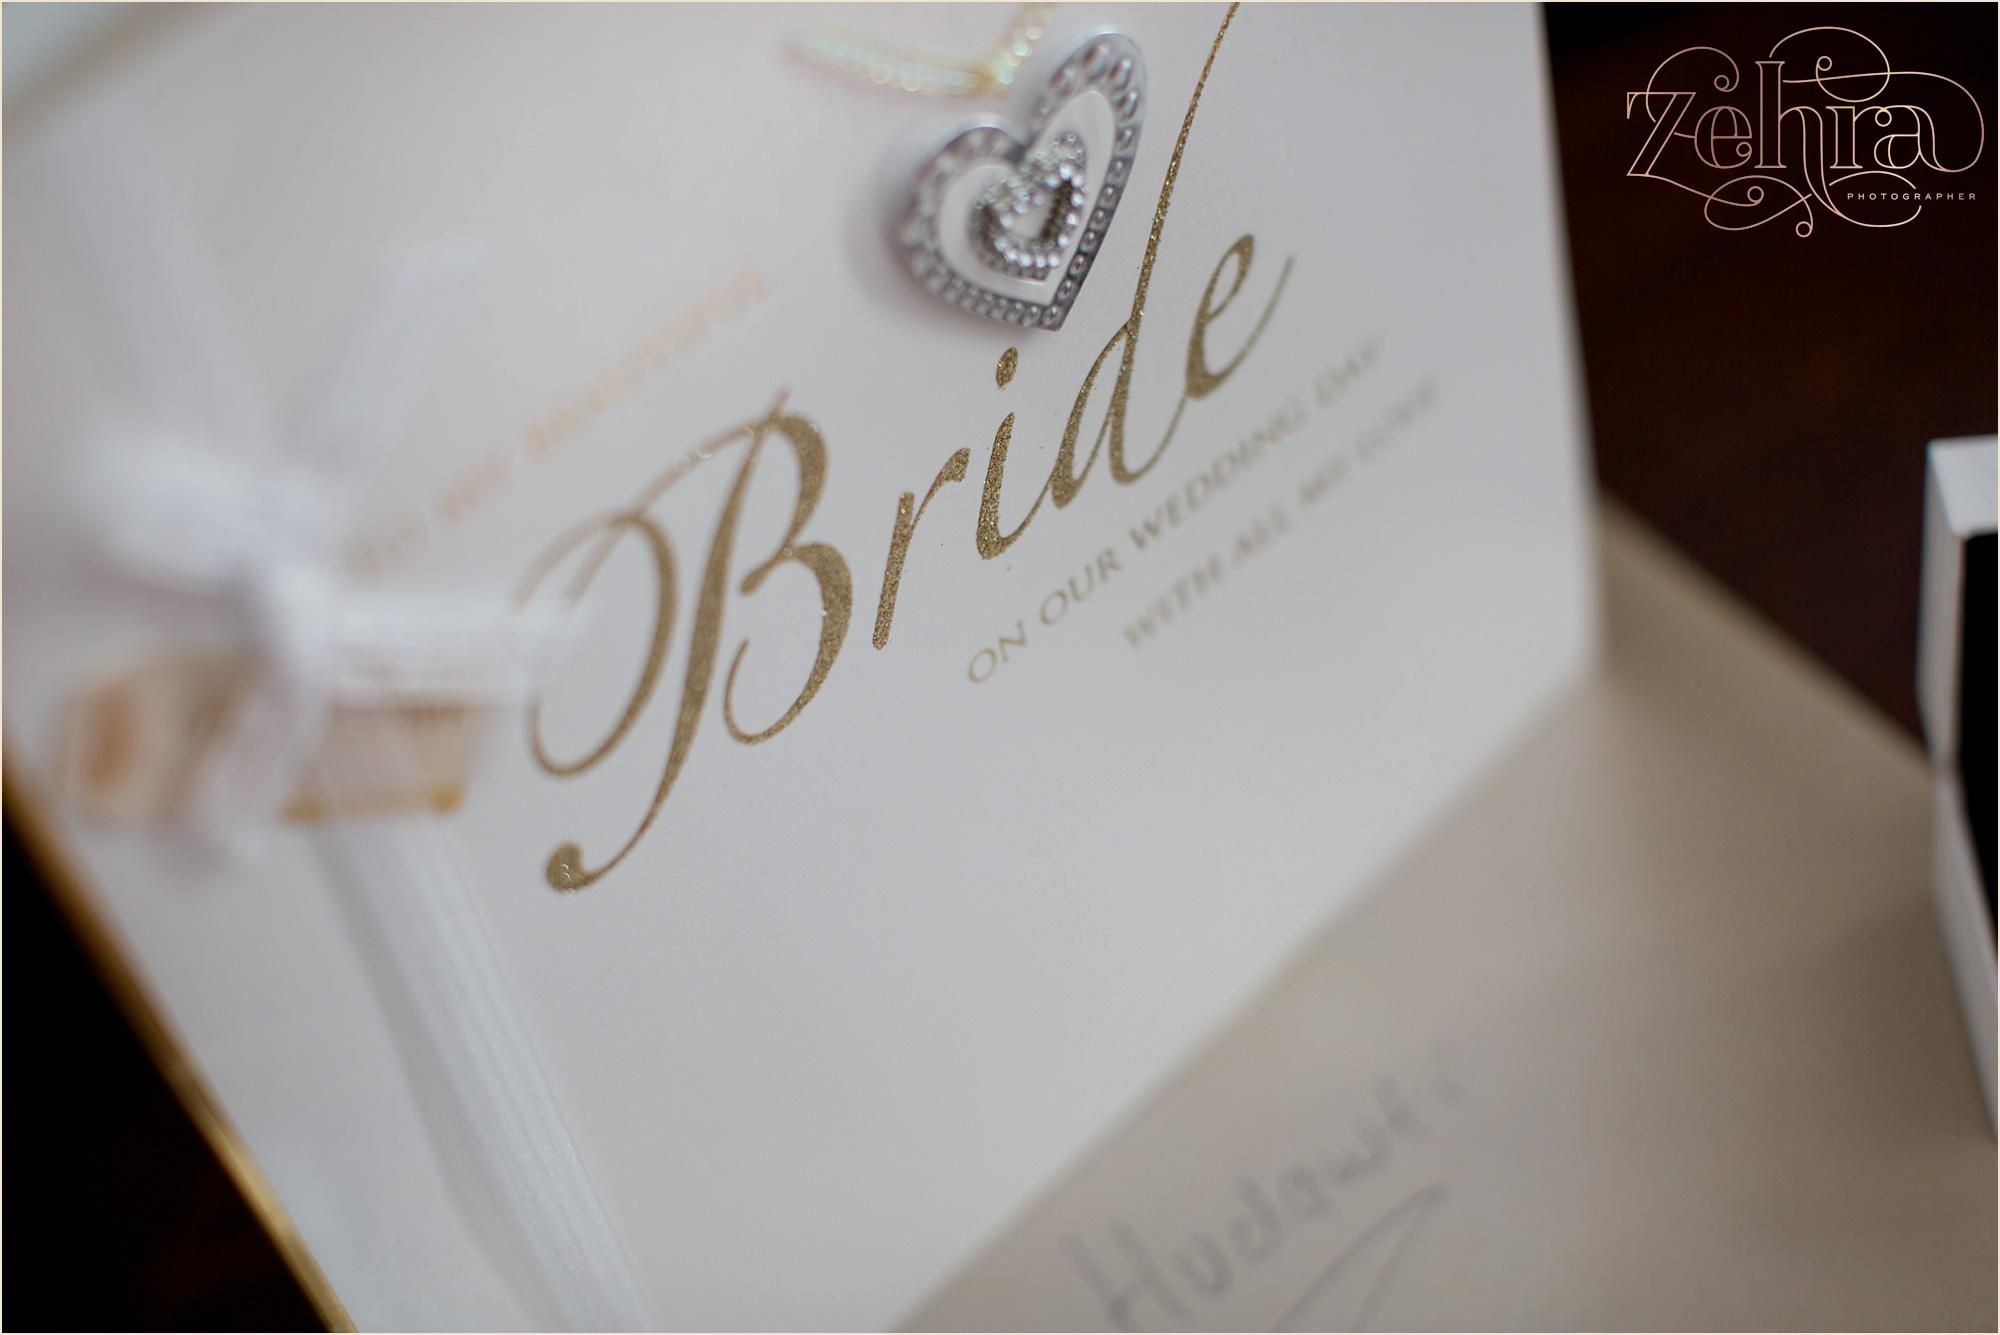 jasira manchester wedding photographer_0058.jpg